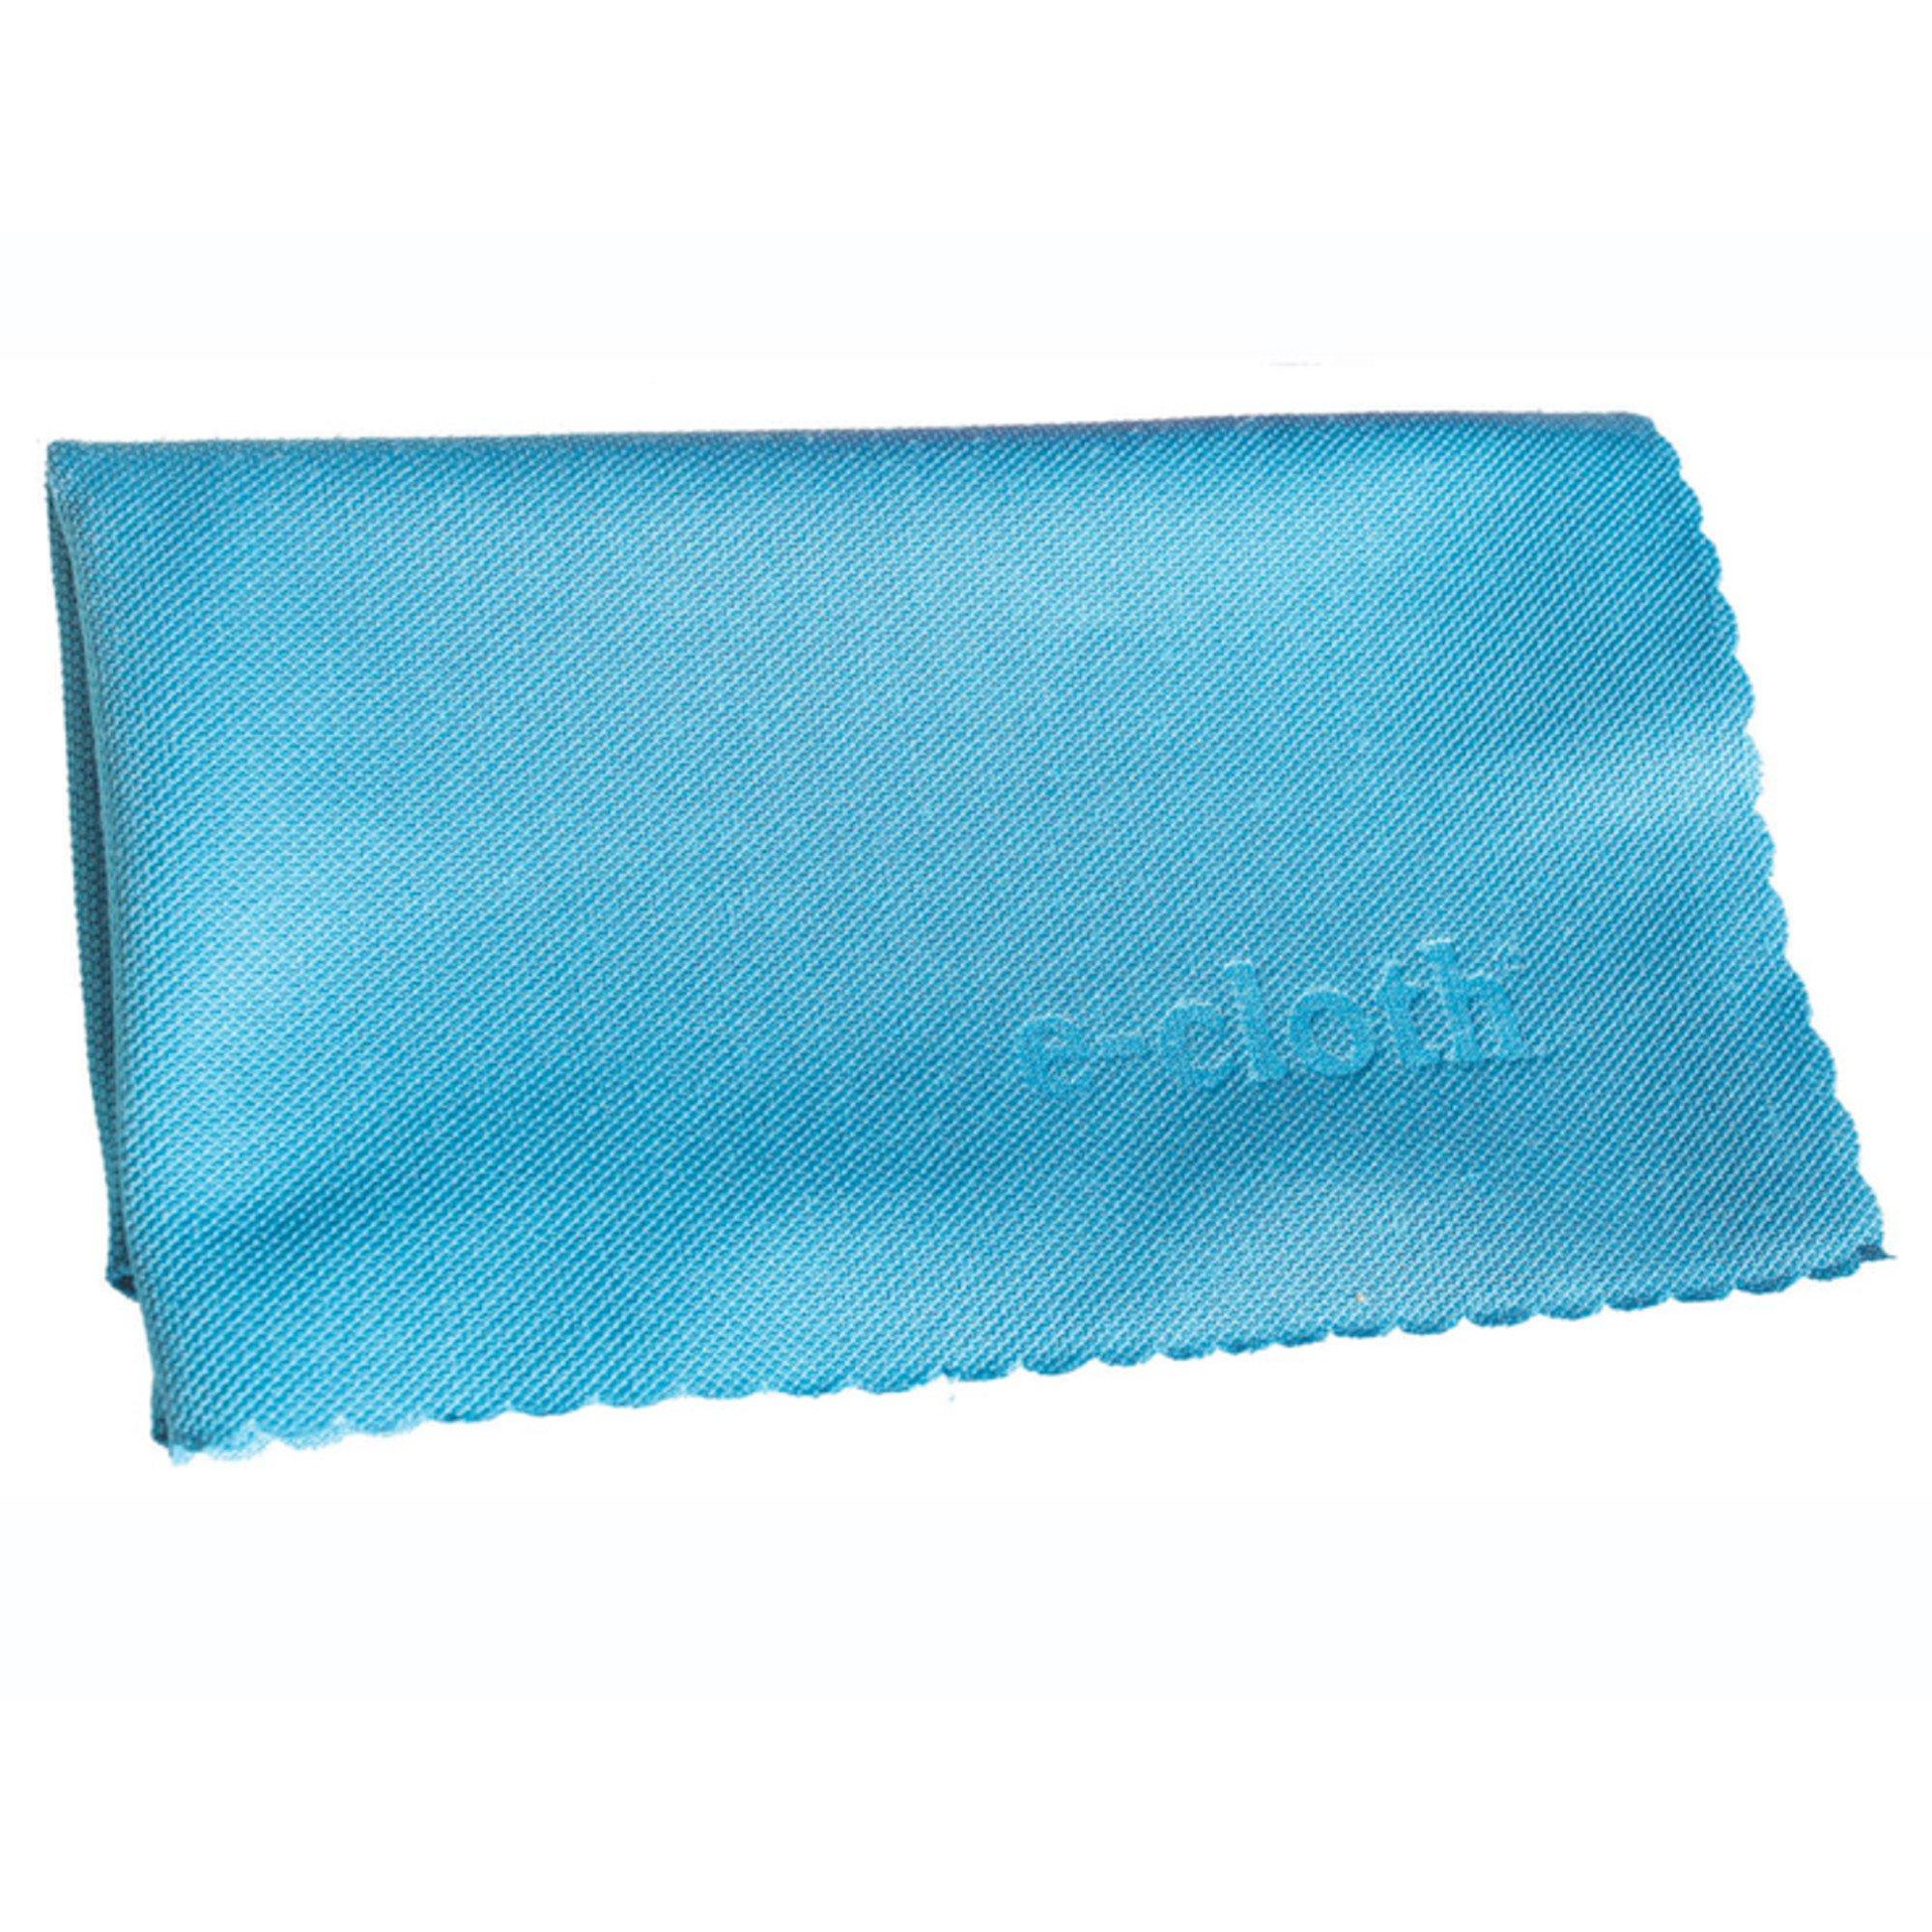 Glass & Polishing Cloth - Brilliant for Sparkling Windows, Mirrors, Glassware, Chrome, and More by E-Cloth (Image #3)